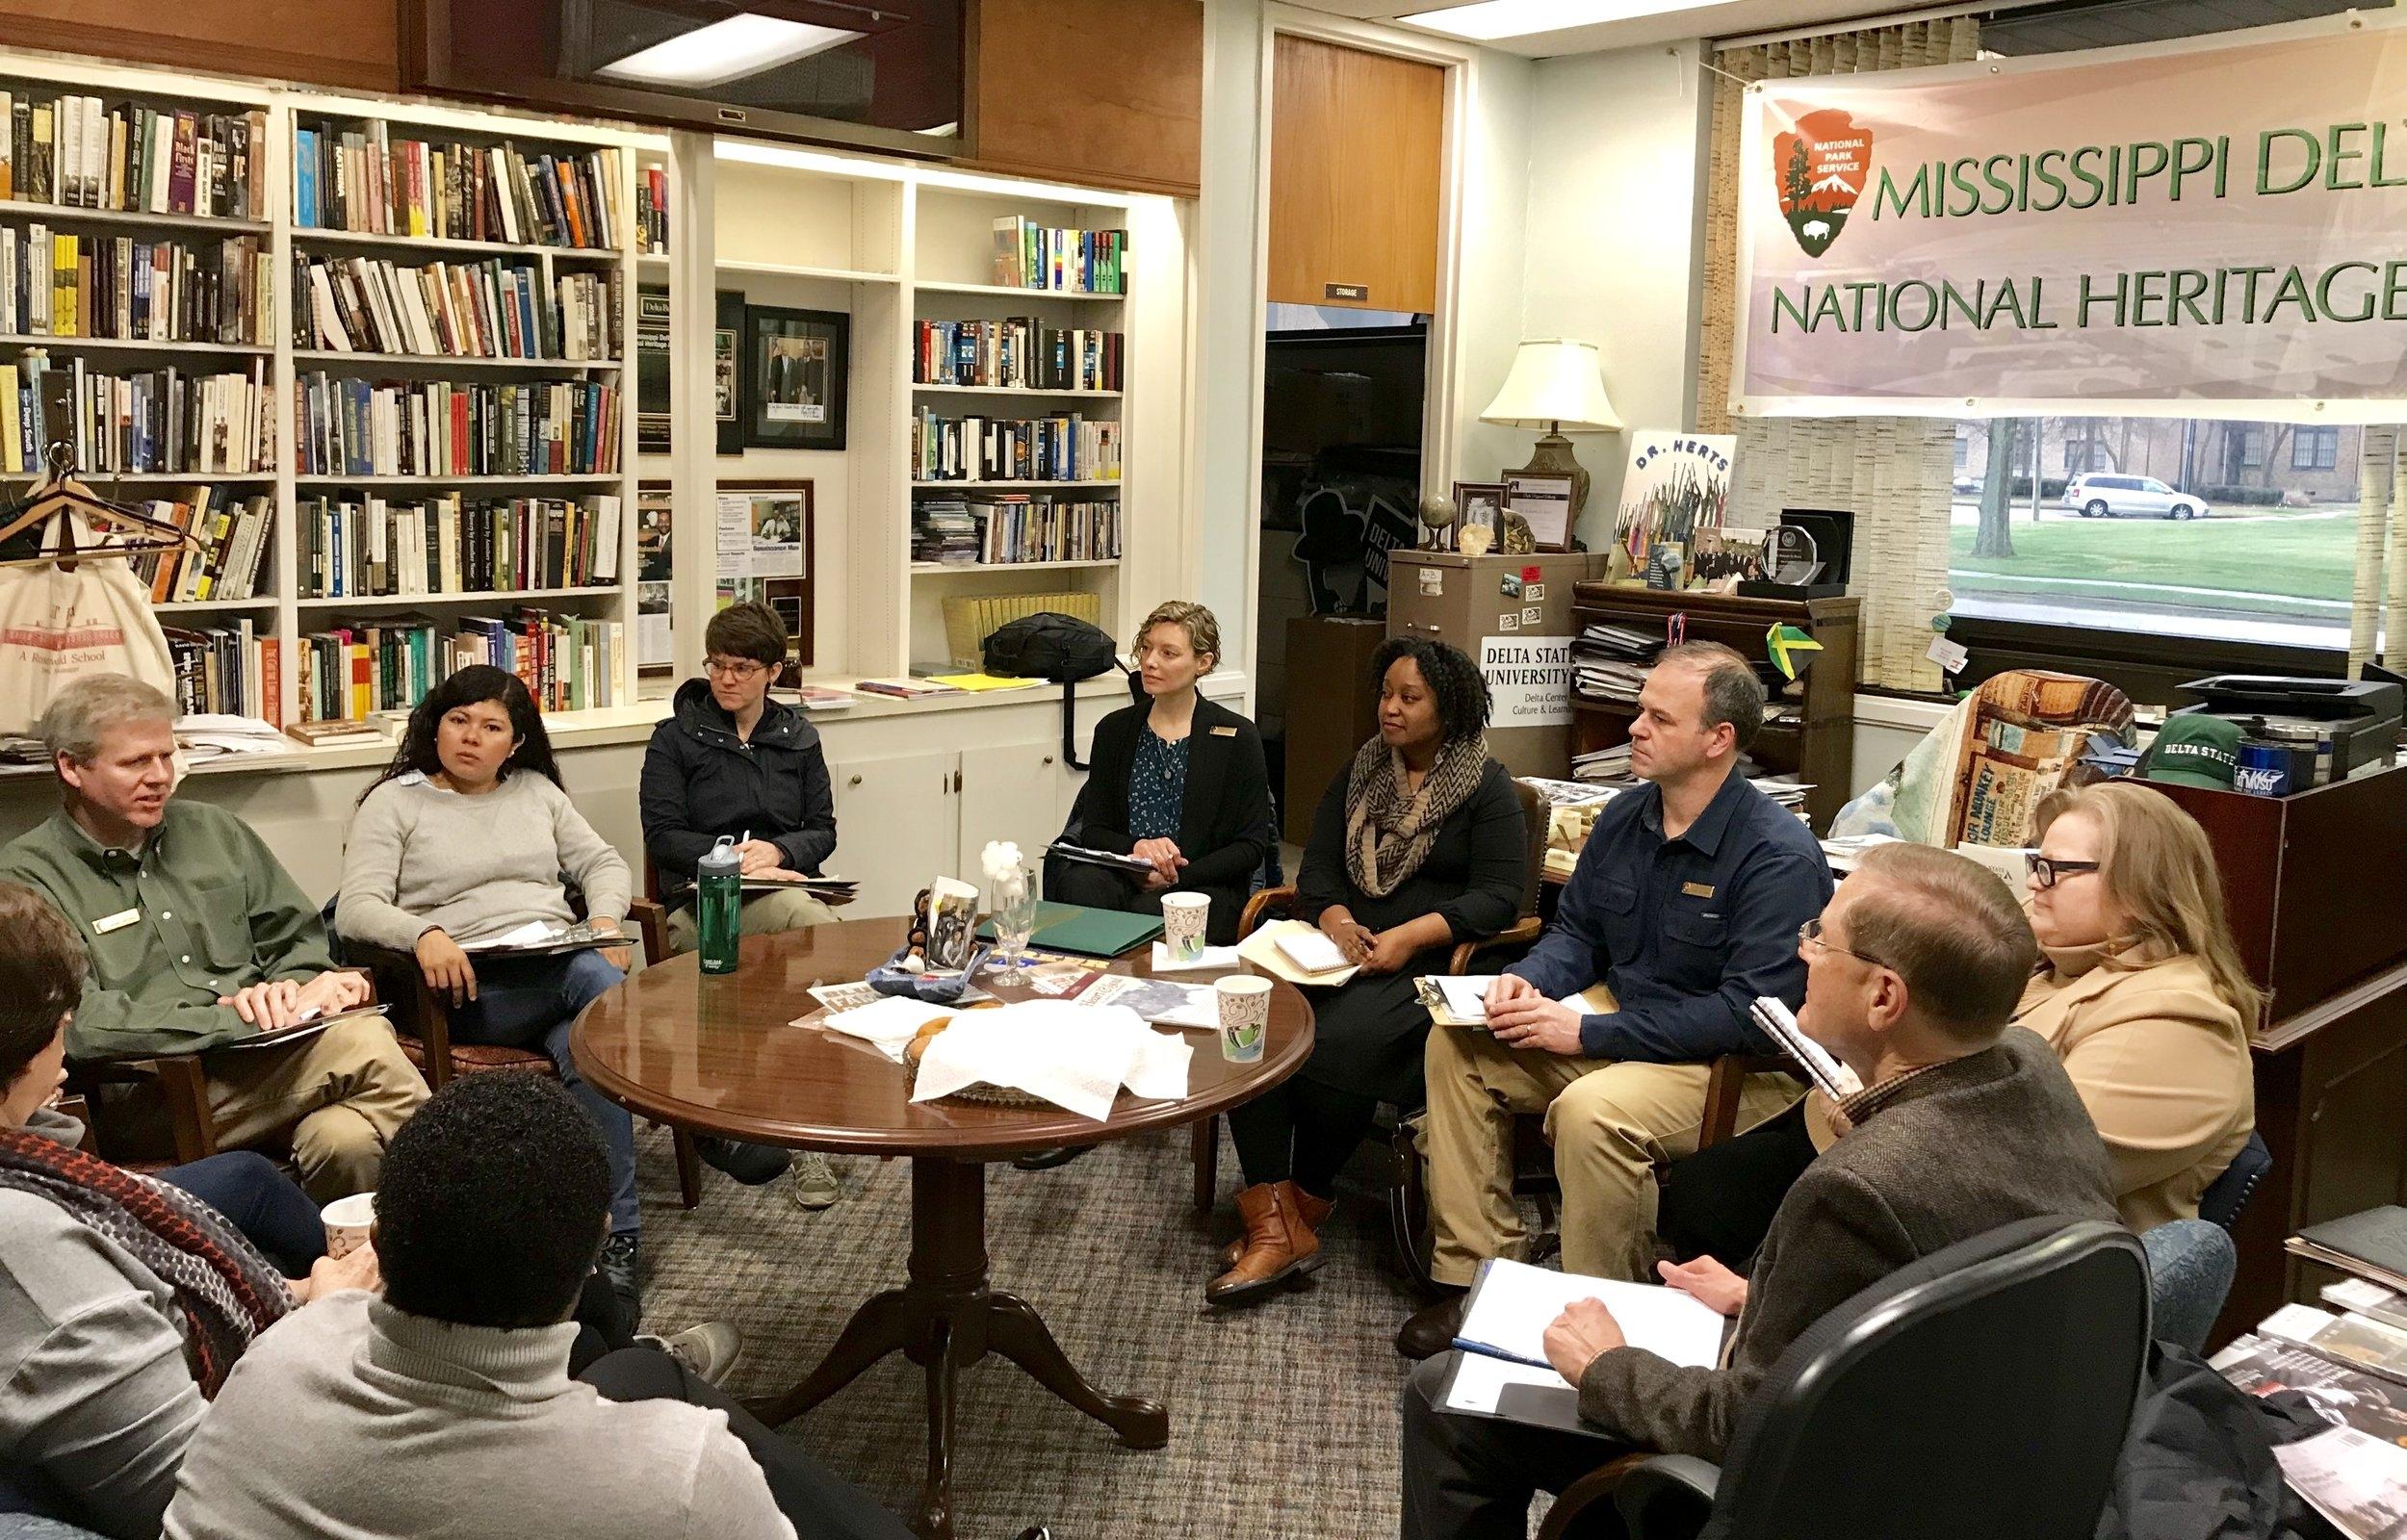 NPS civil rights visit to DCCL Feb 2018.jpg